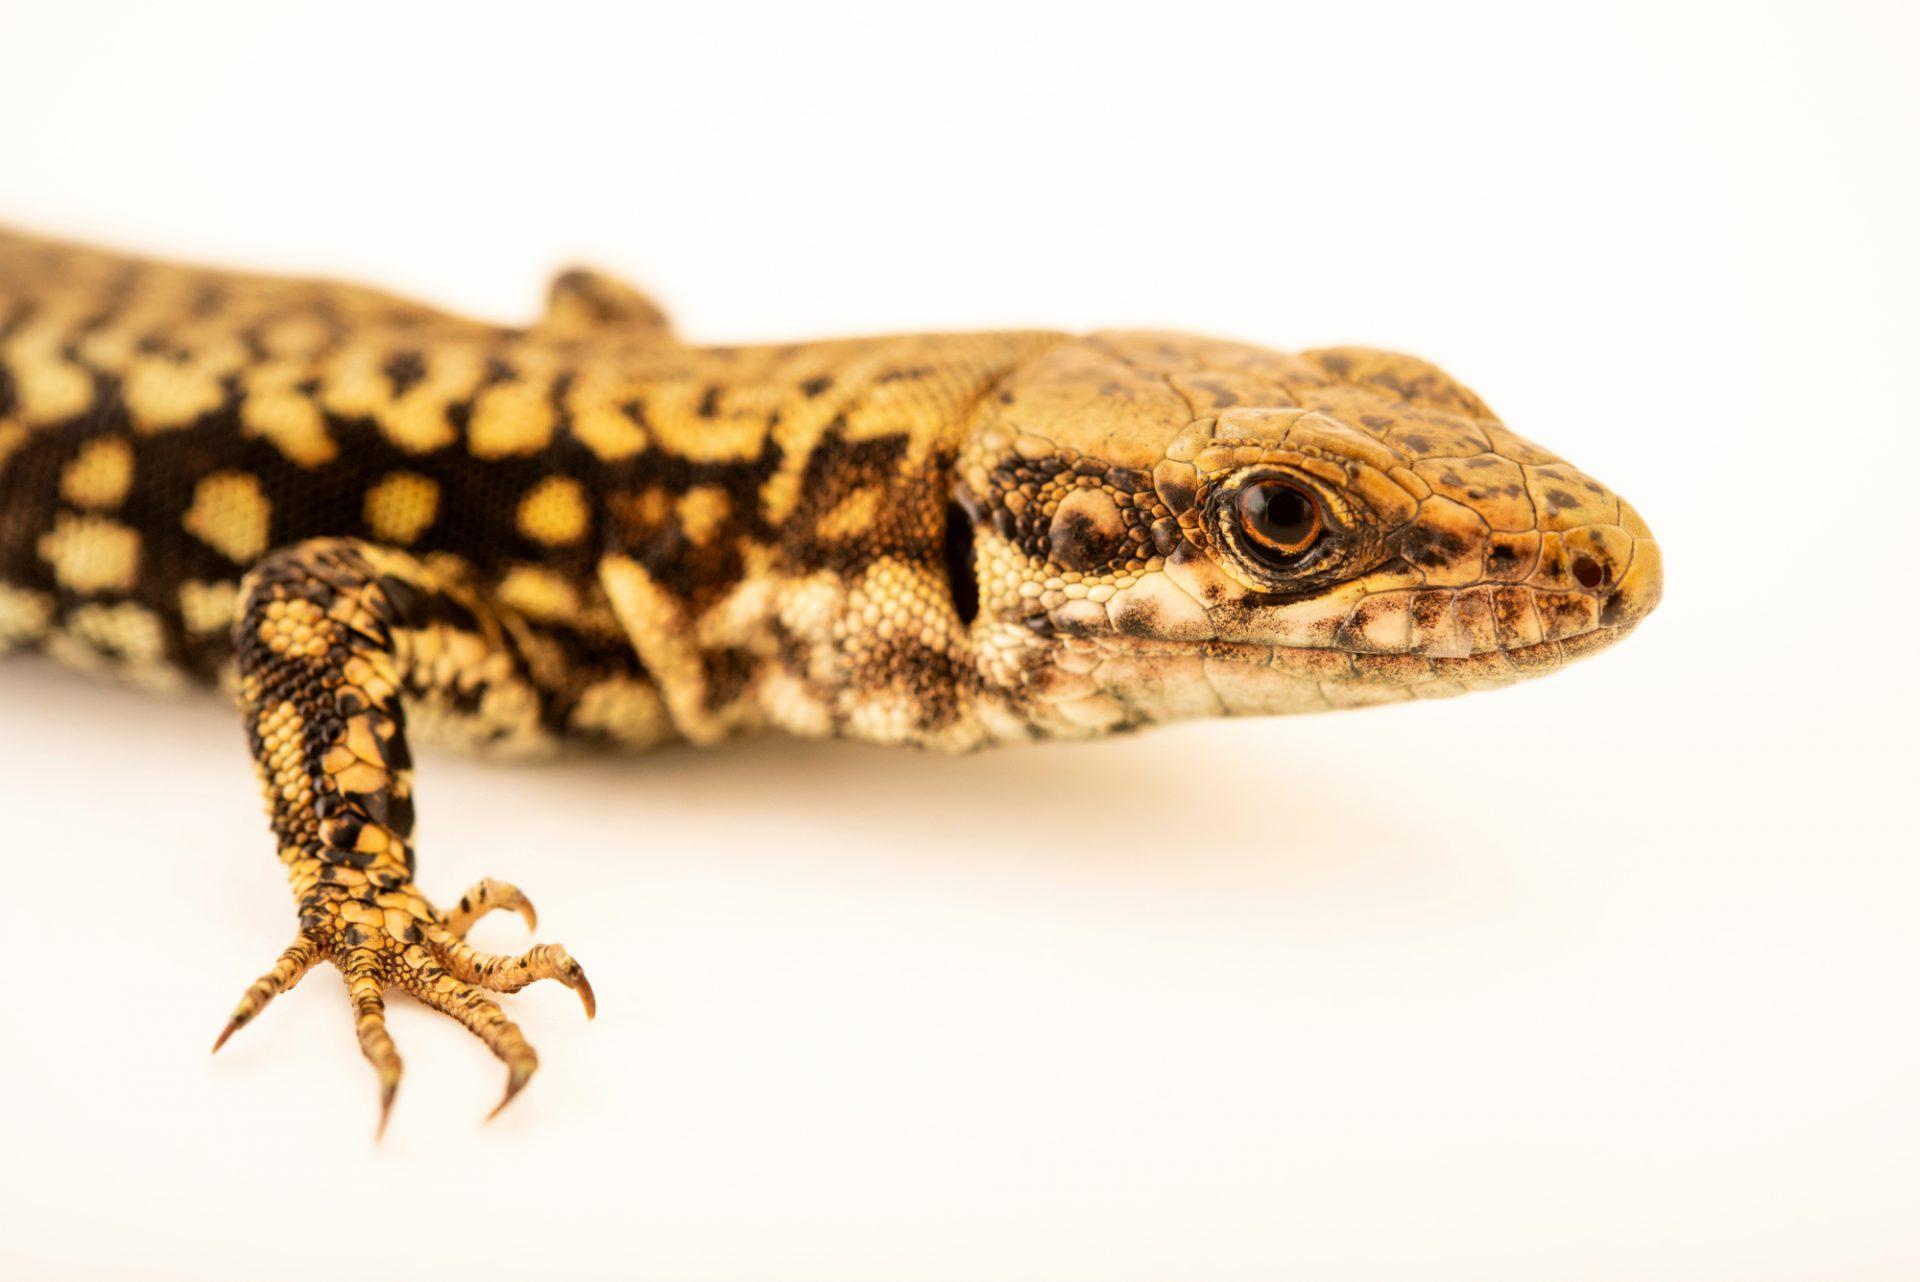 Photo: Common wall lizard (Podarcis muralis) at Wroclaw Zoo.